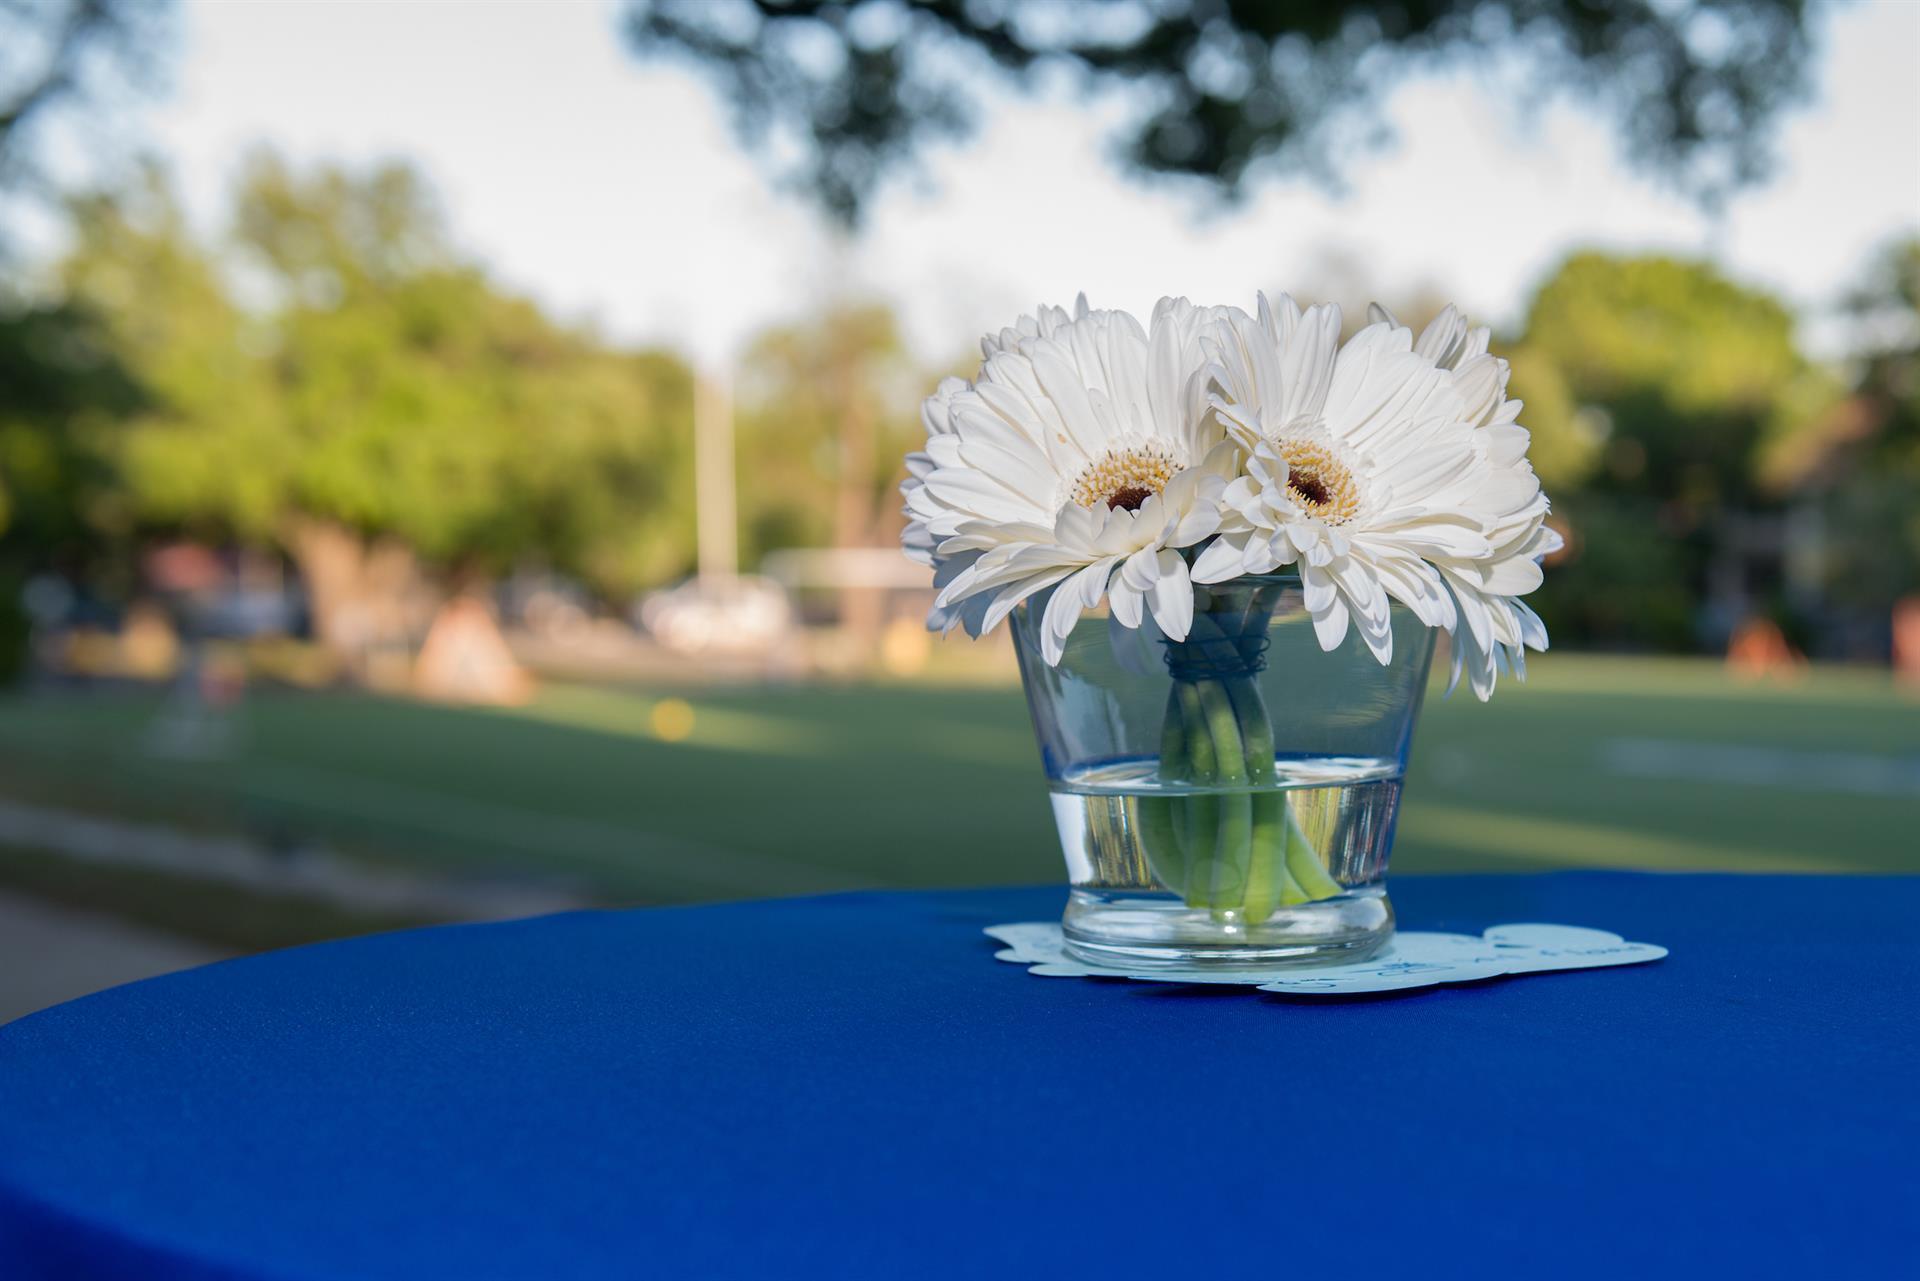 Register Today for the Blue&White Unite Spring Gala